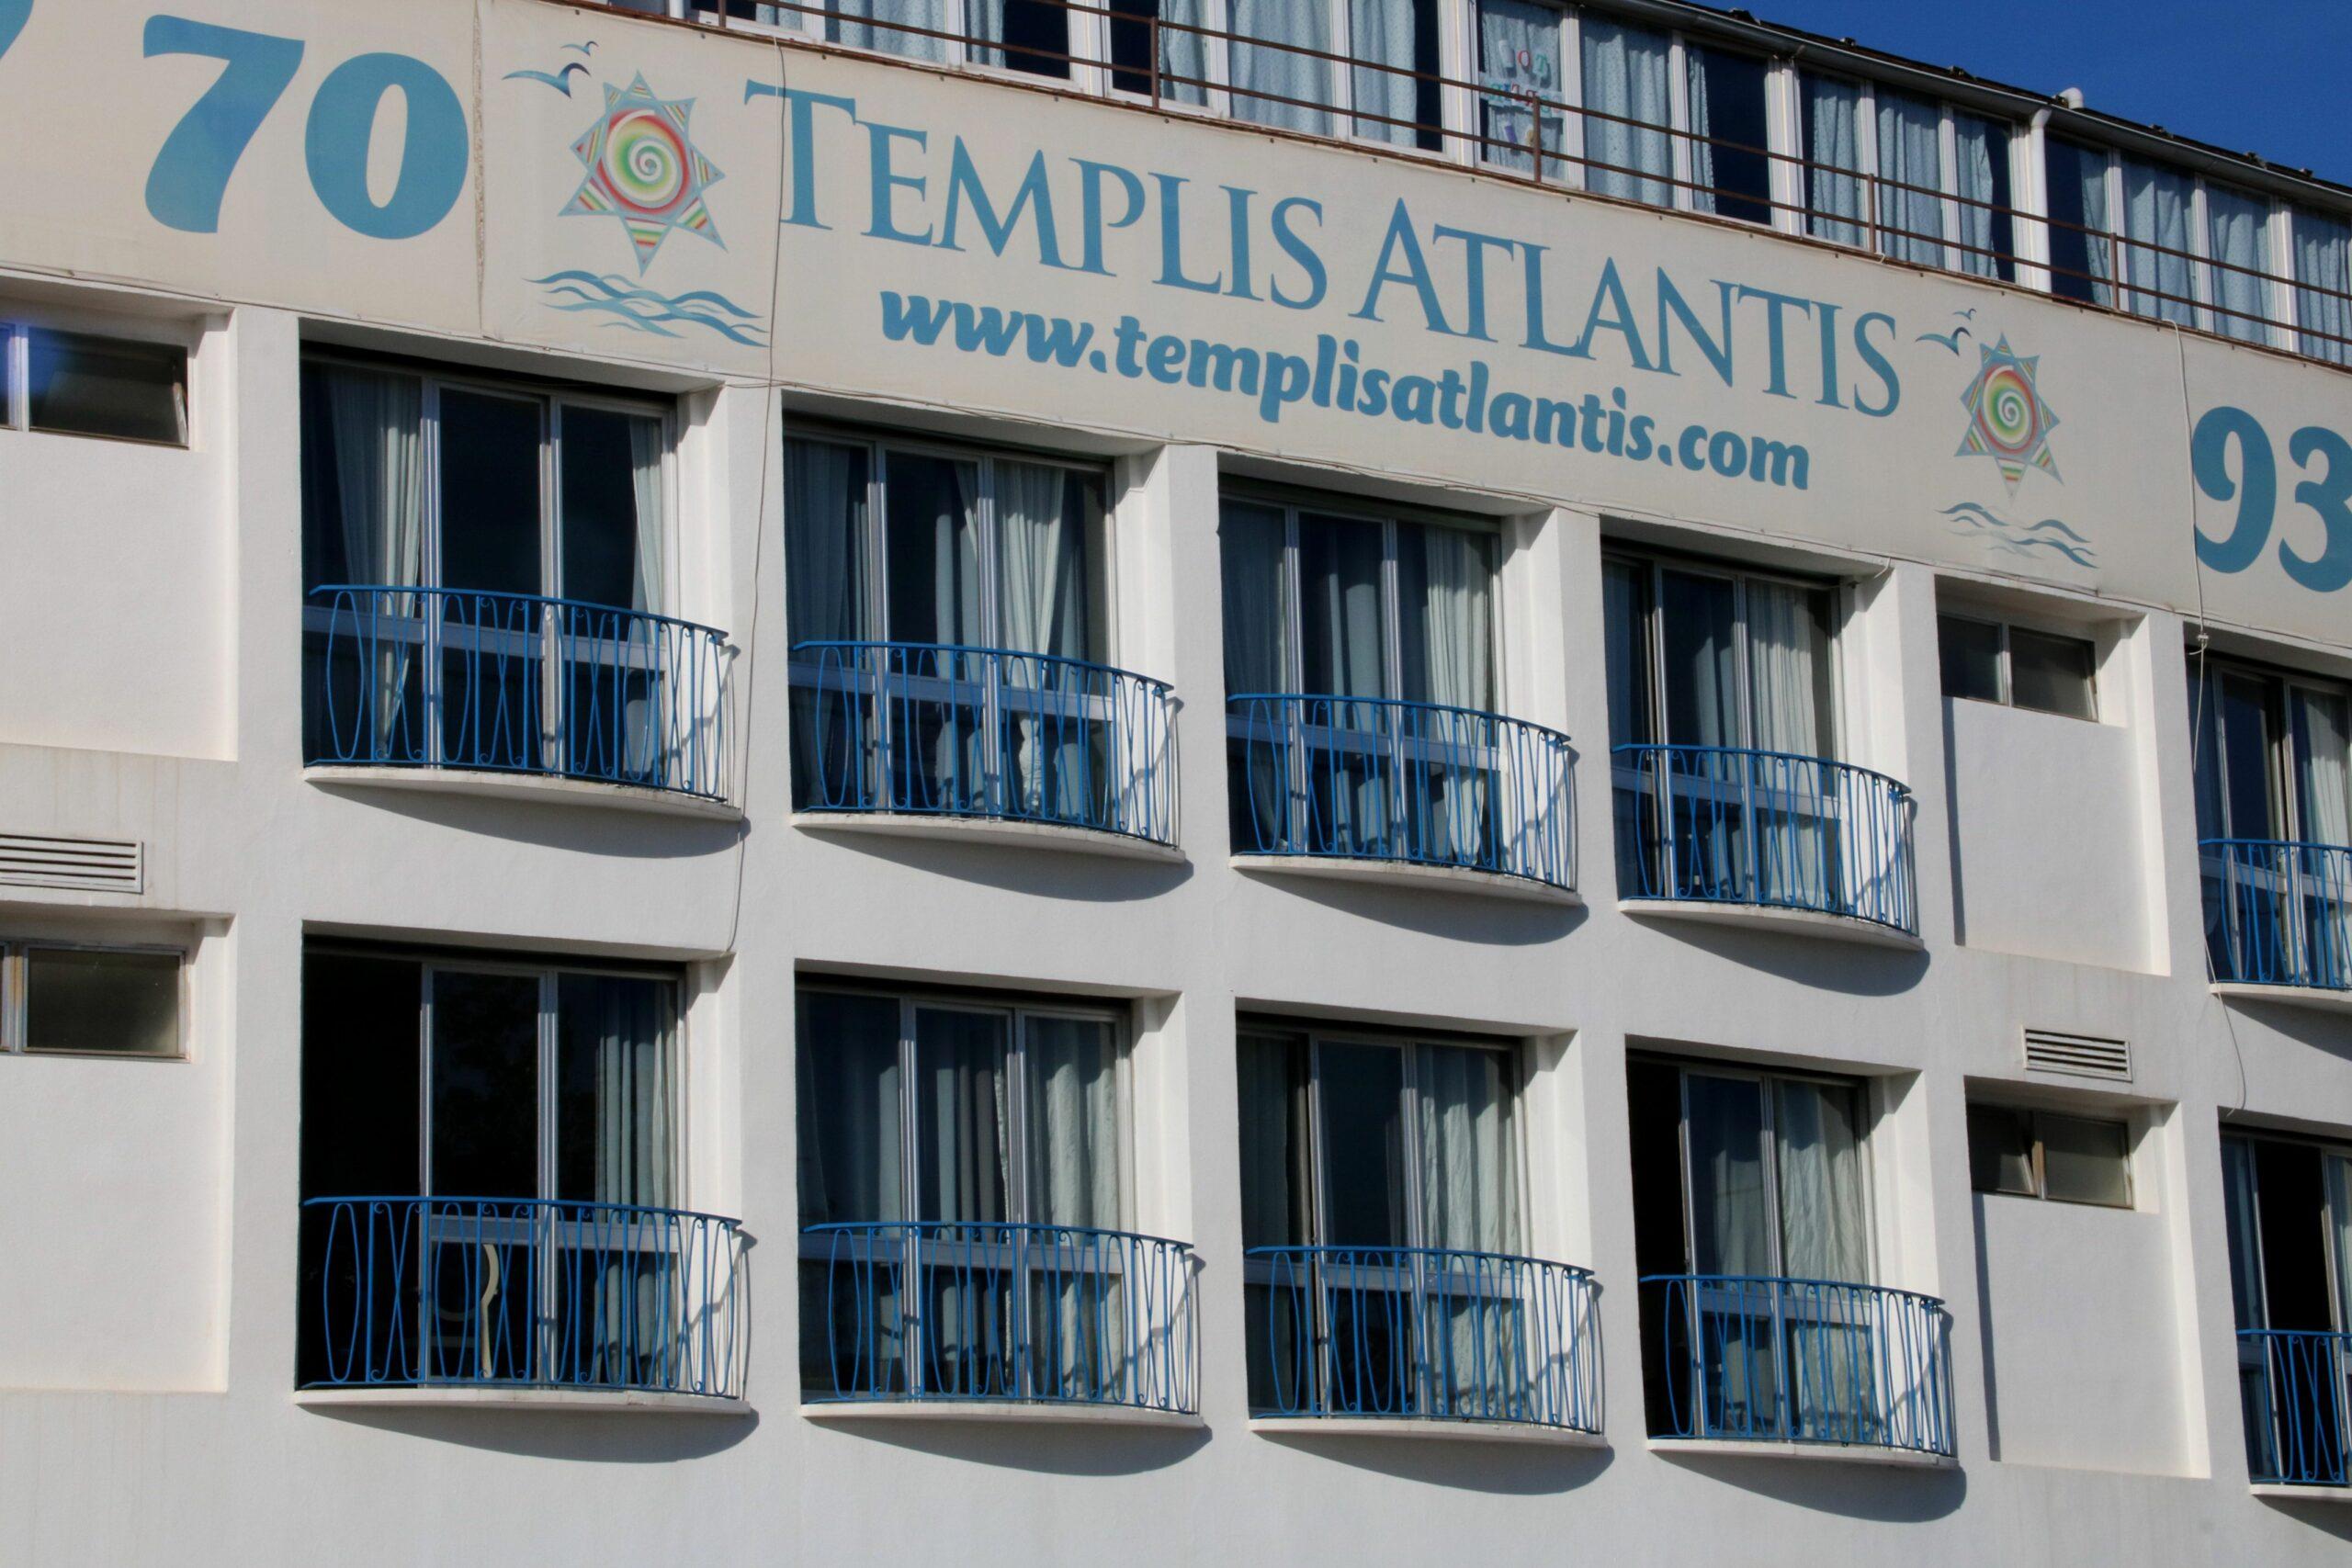 La fa?ana de la resid?ncia Templis Atlantis de Cubelles (ACN)